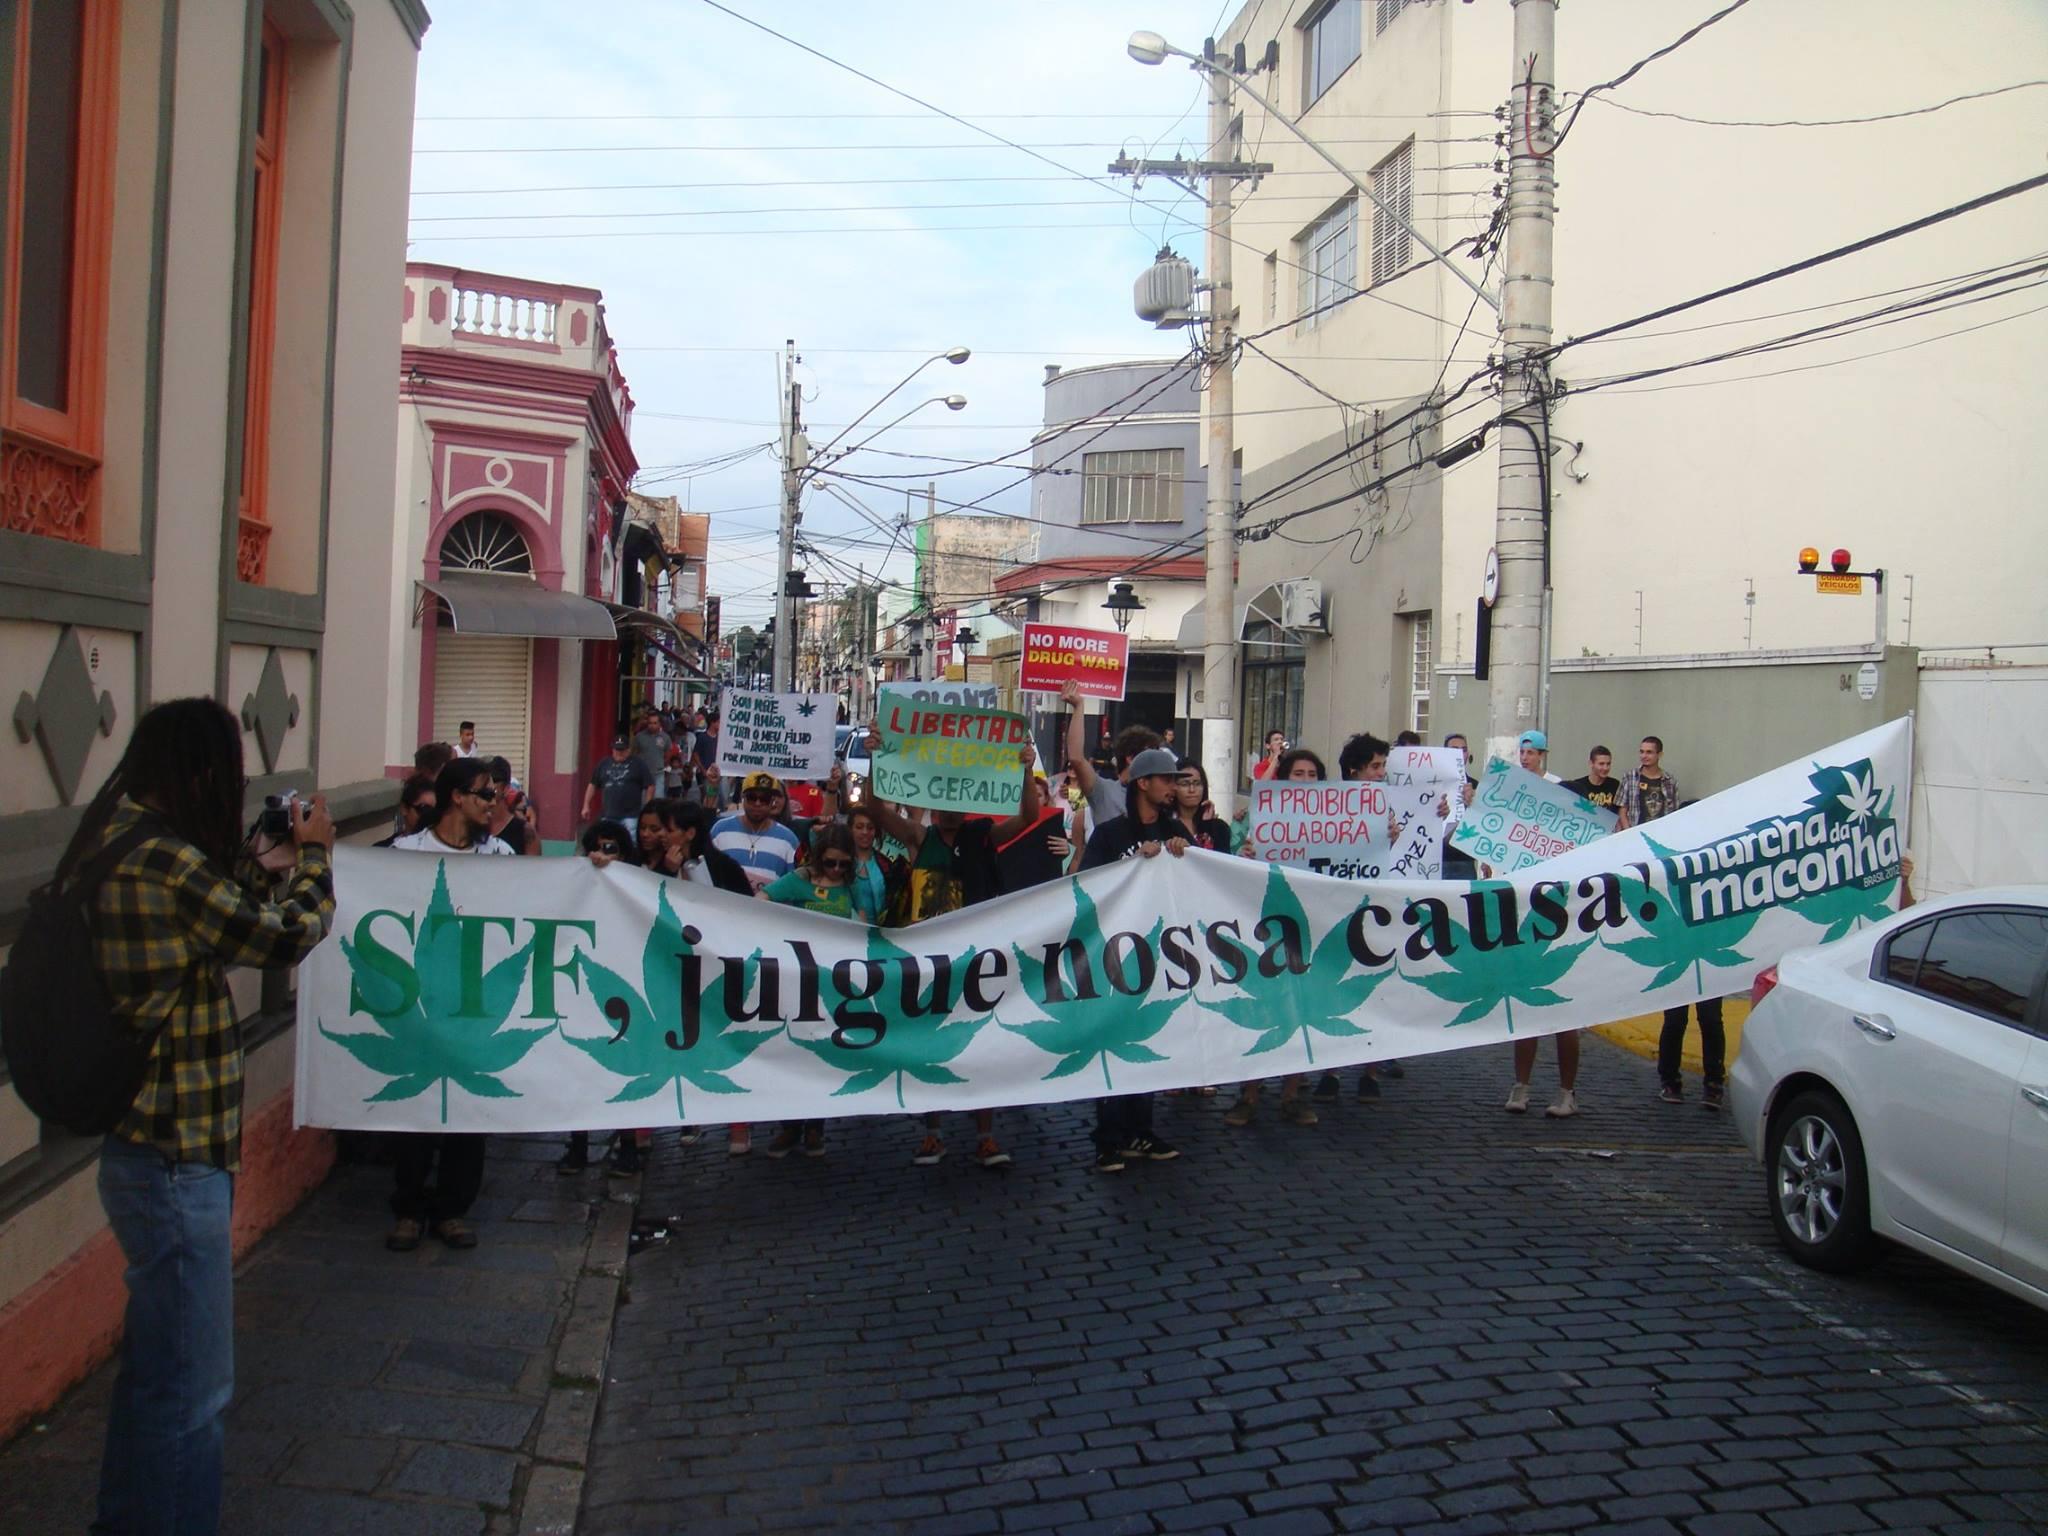 Marcha da Maconha Atibaia